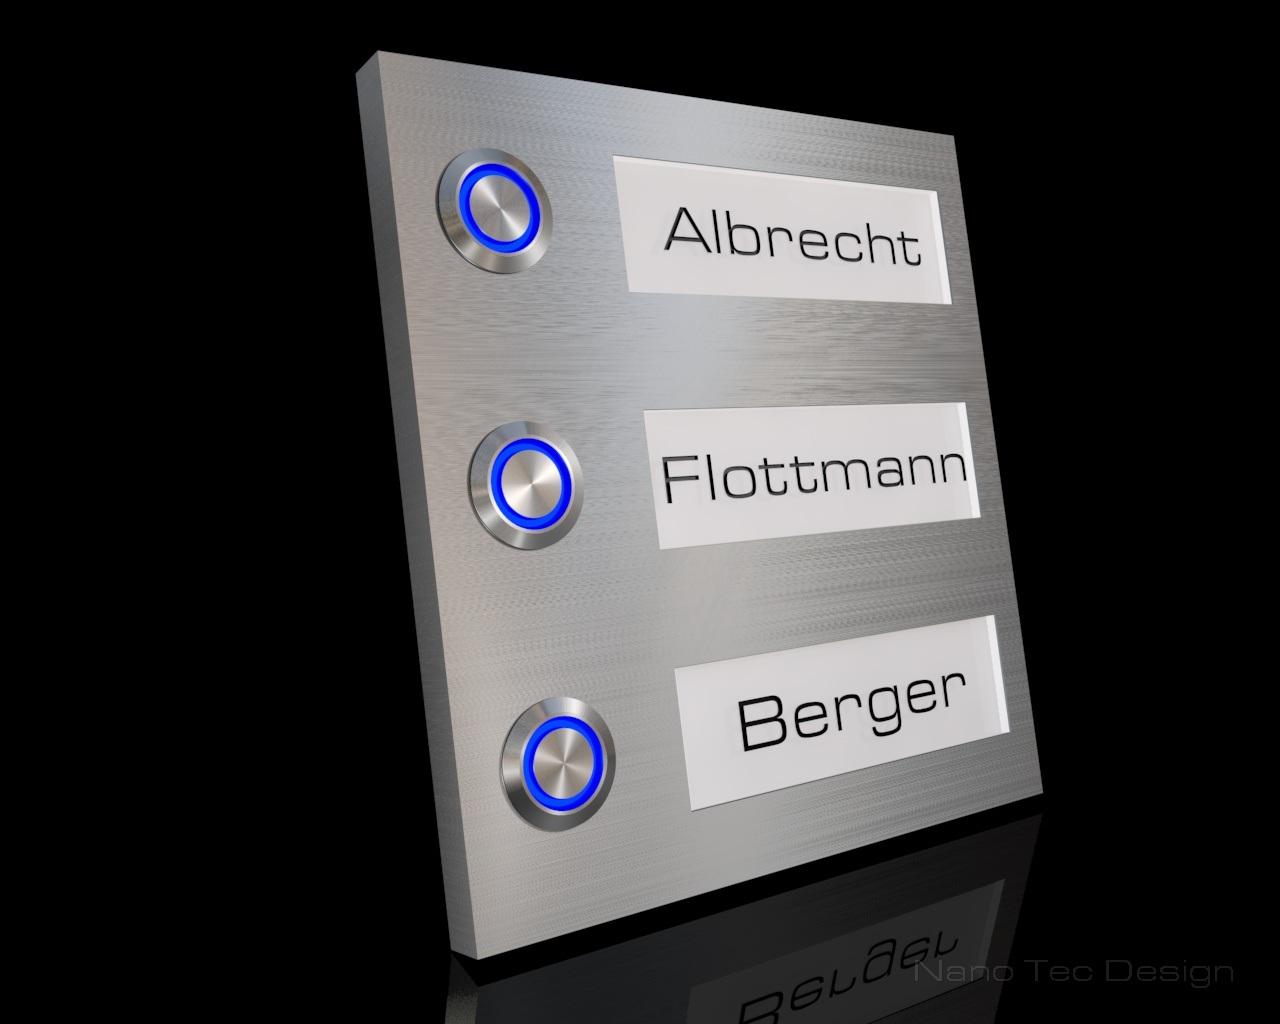 Design Edelstahlklingel mit Led-Namesbeleuchtung zum auswechseln